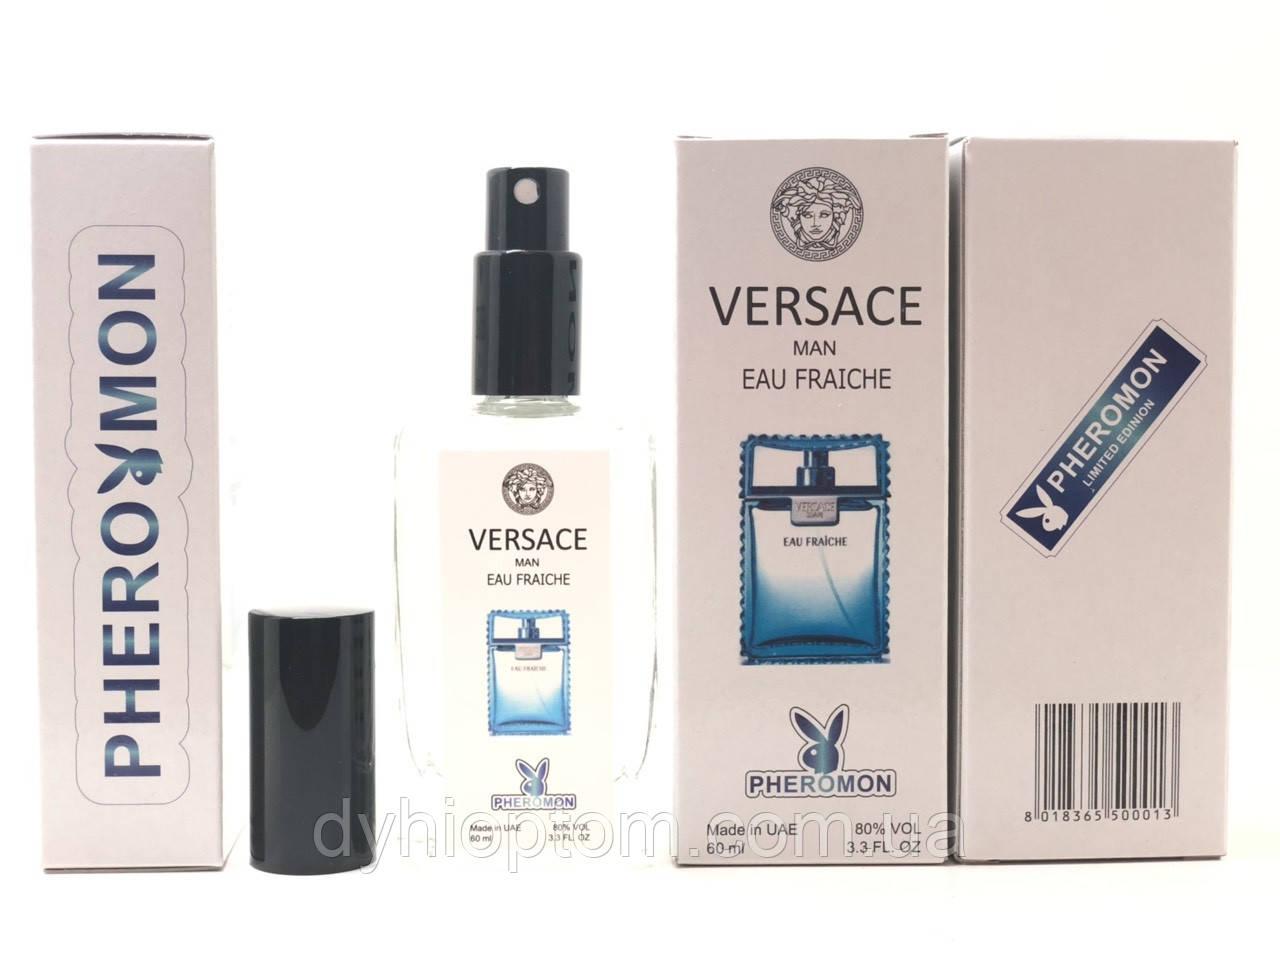 Мужской парфюм Versace Man Eau Fraiche, 60 ml